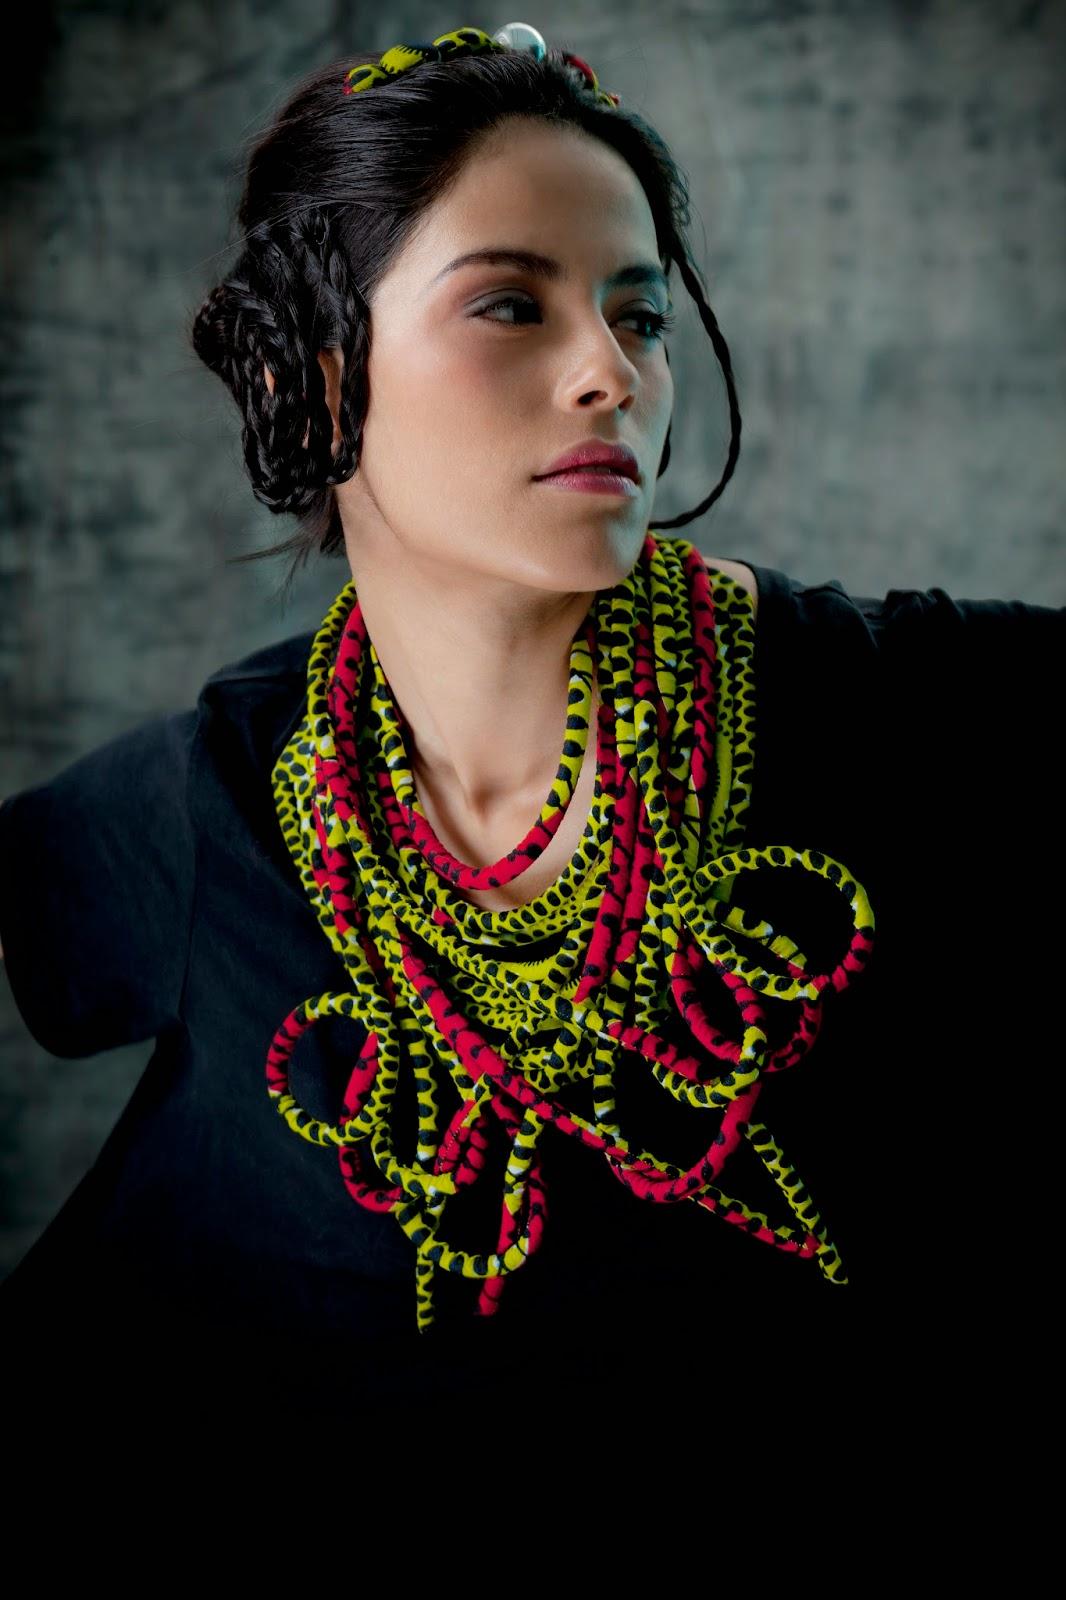 Nadia Dafri fabric jewelry designer